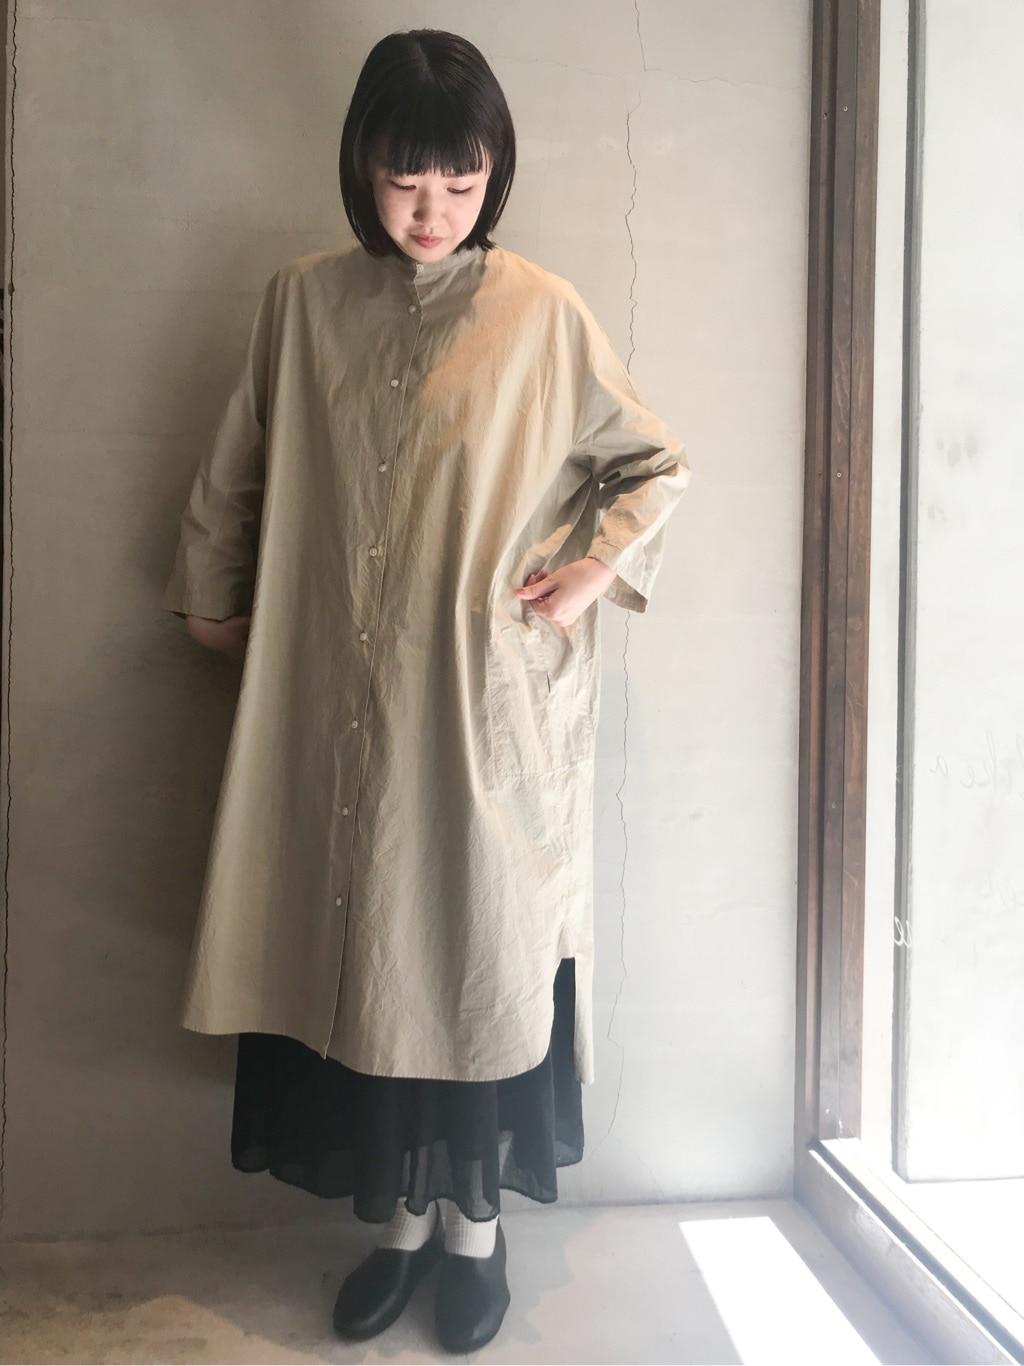 yuni 神戸路面 身長:166cm 2020.09.14